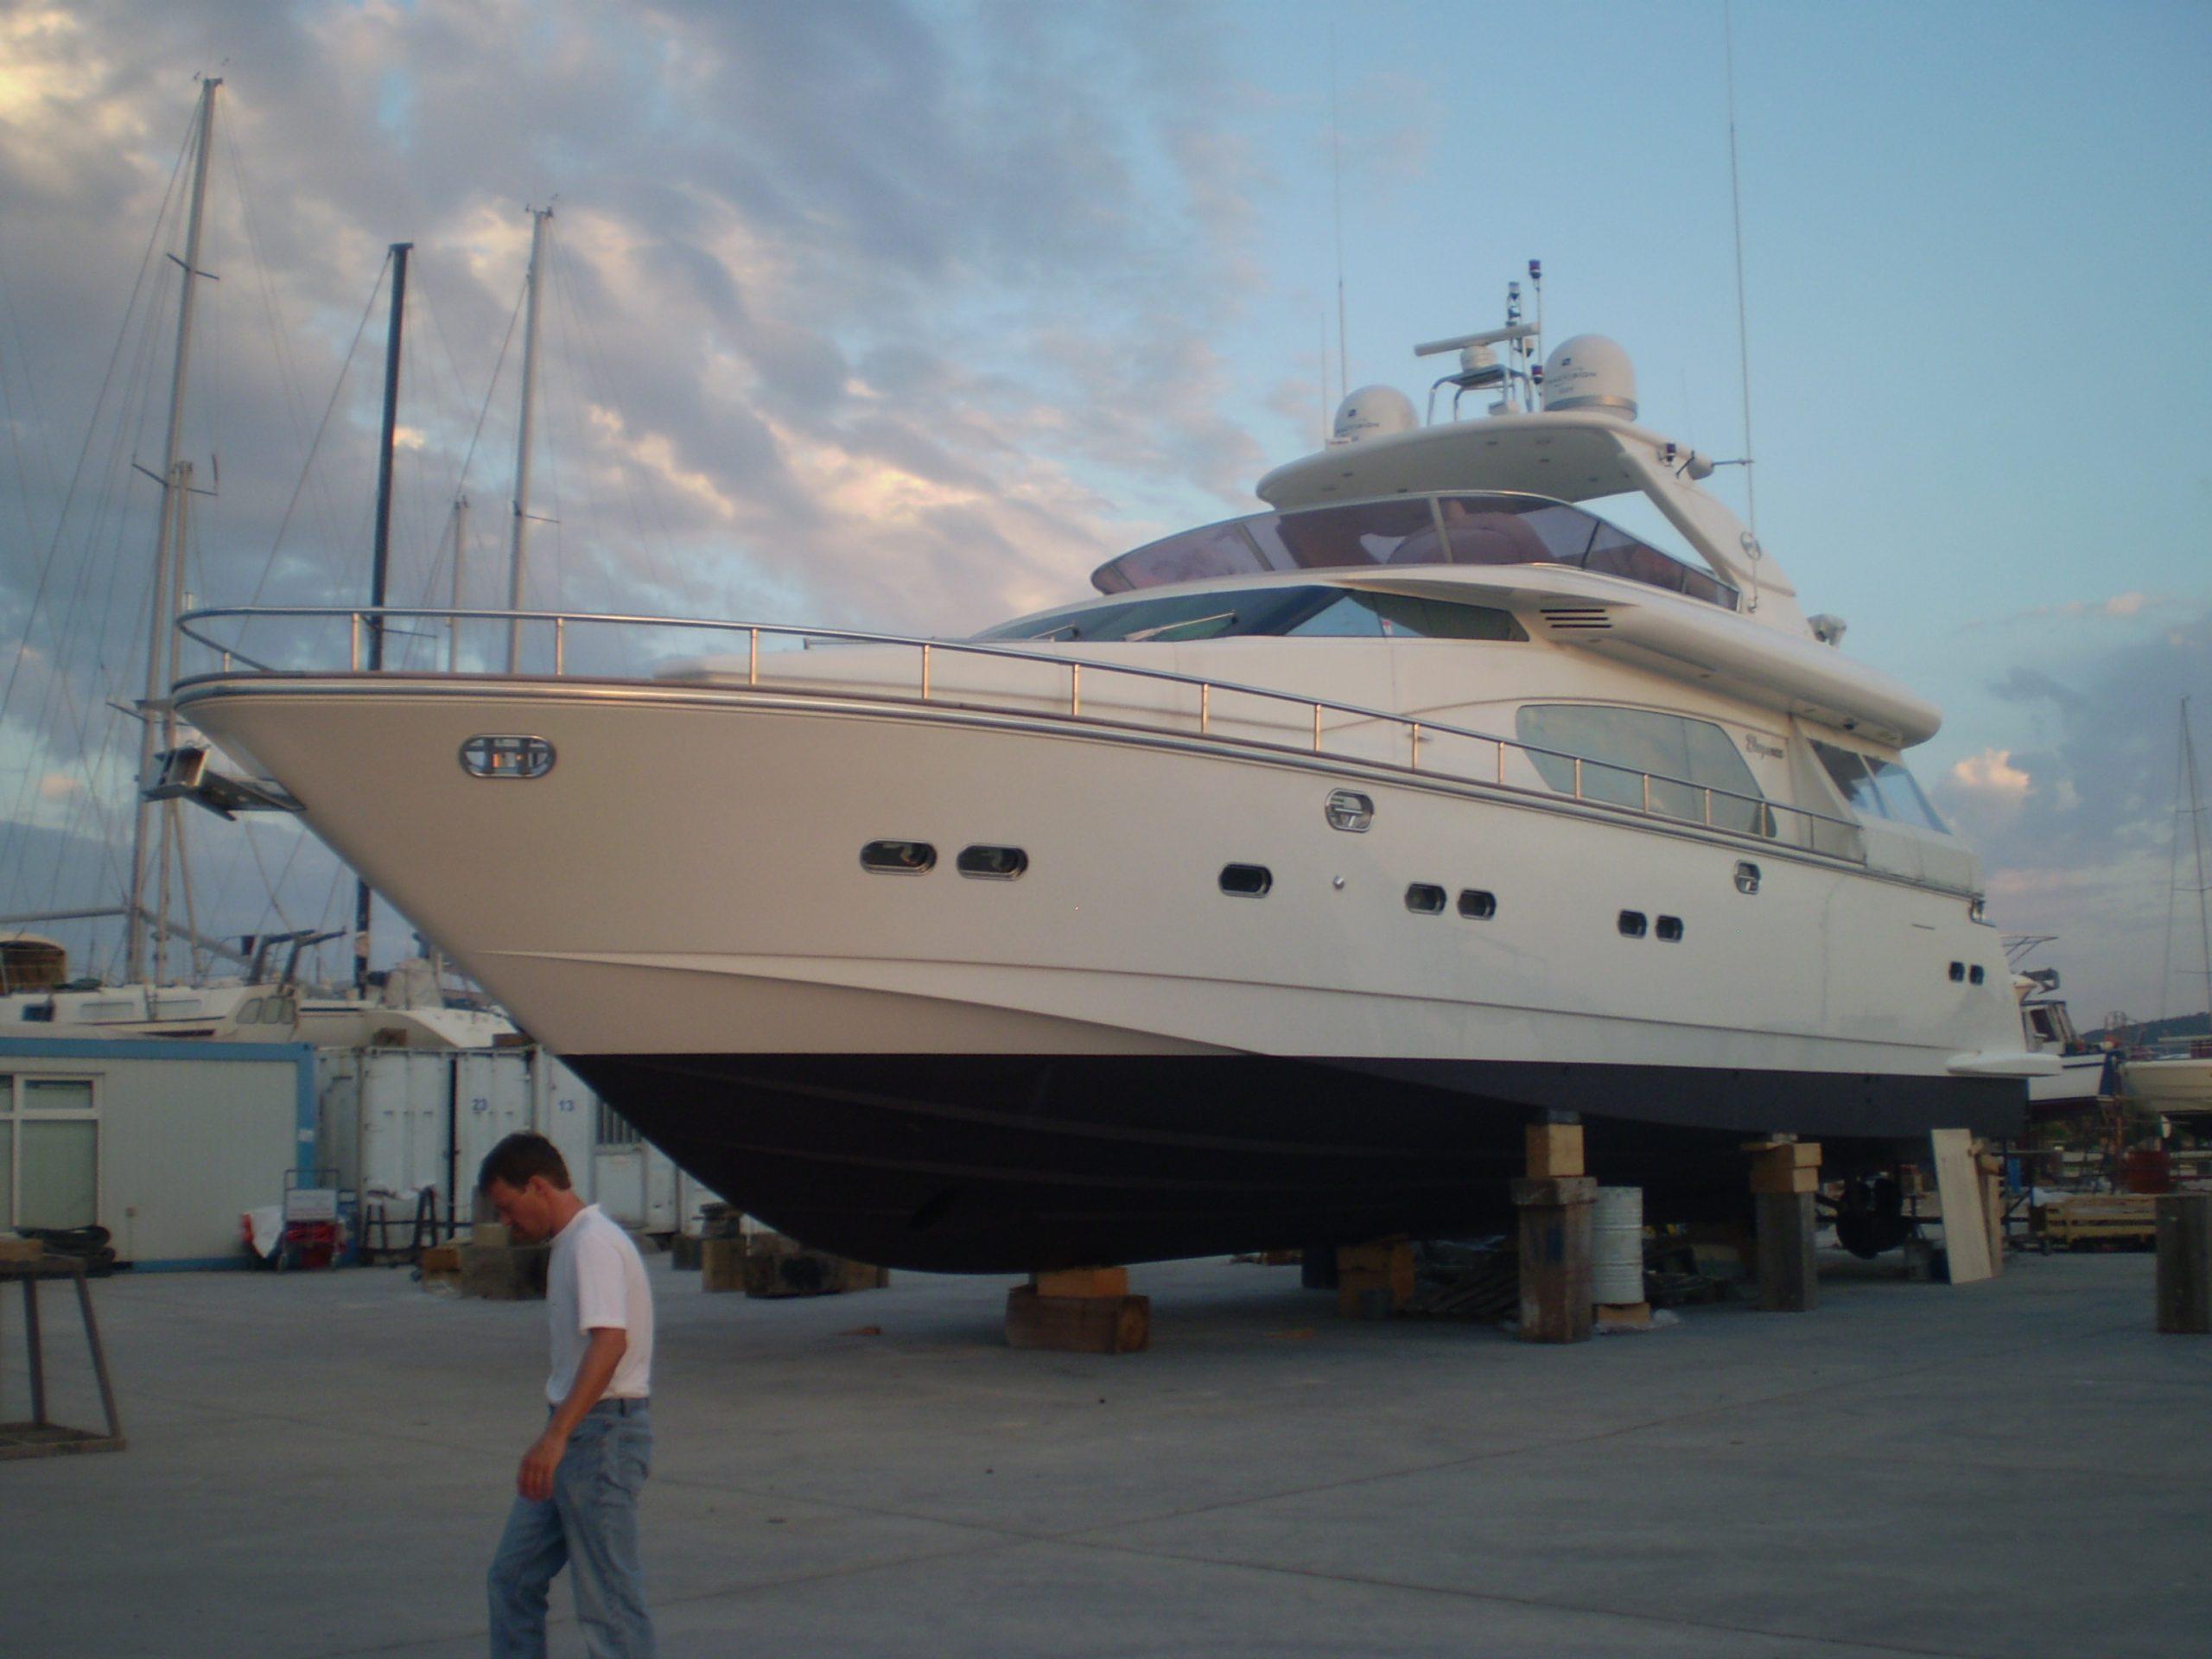 Yachty - danubemarine